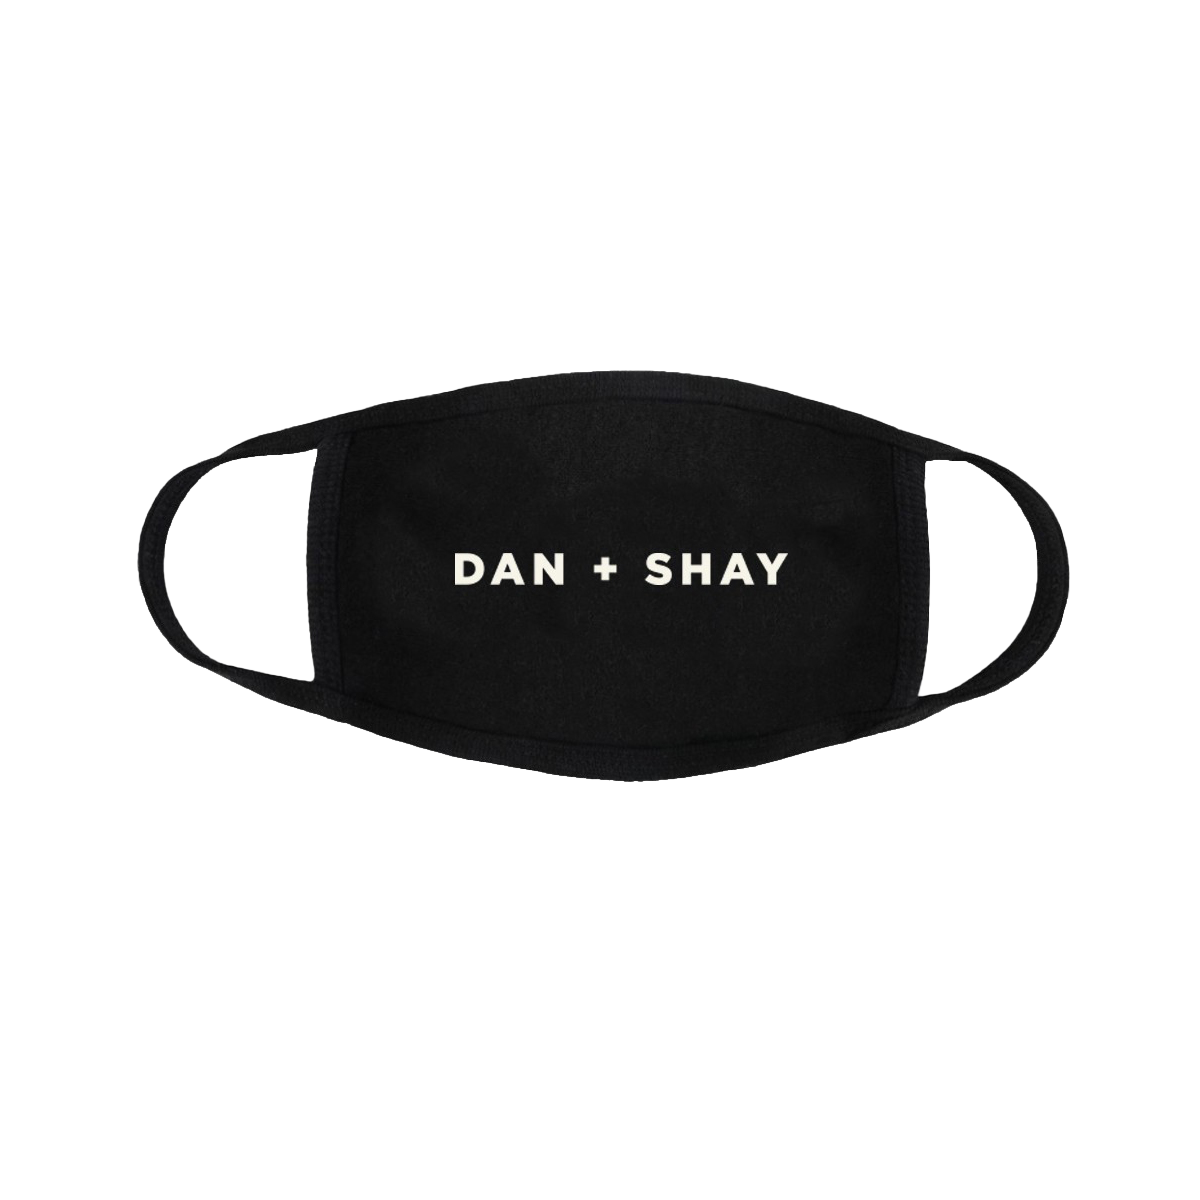 Dan + Shay Logo Face Mask